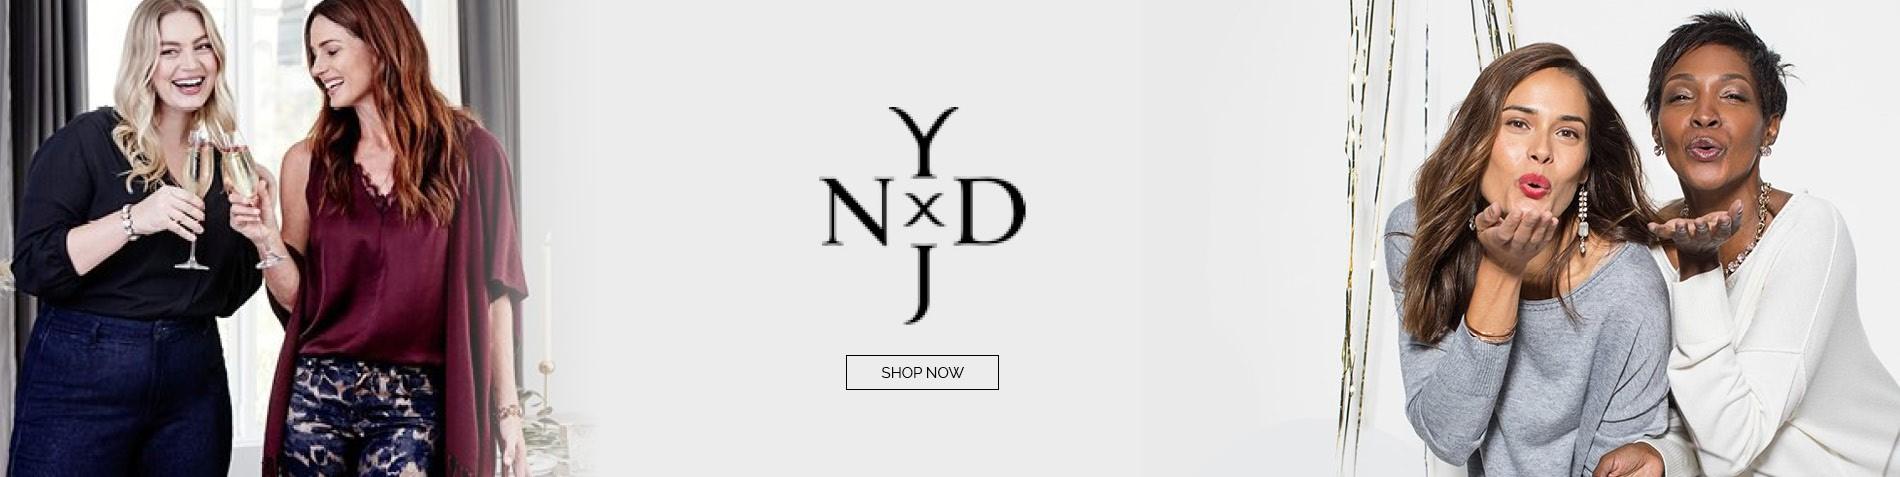 NYDJ Banner